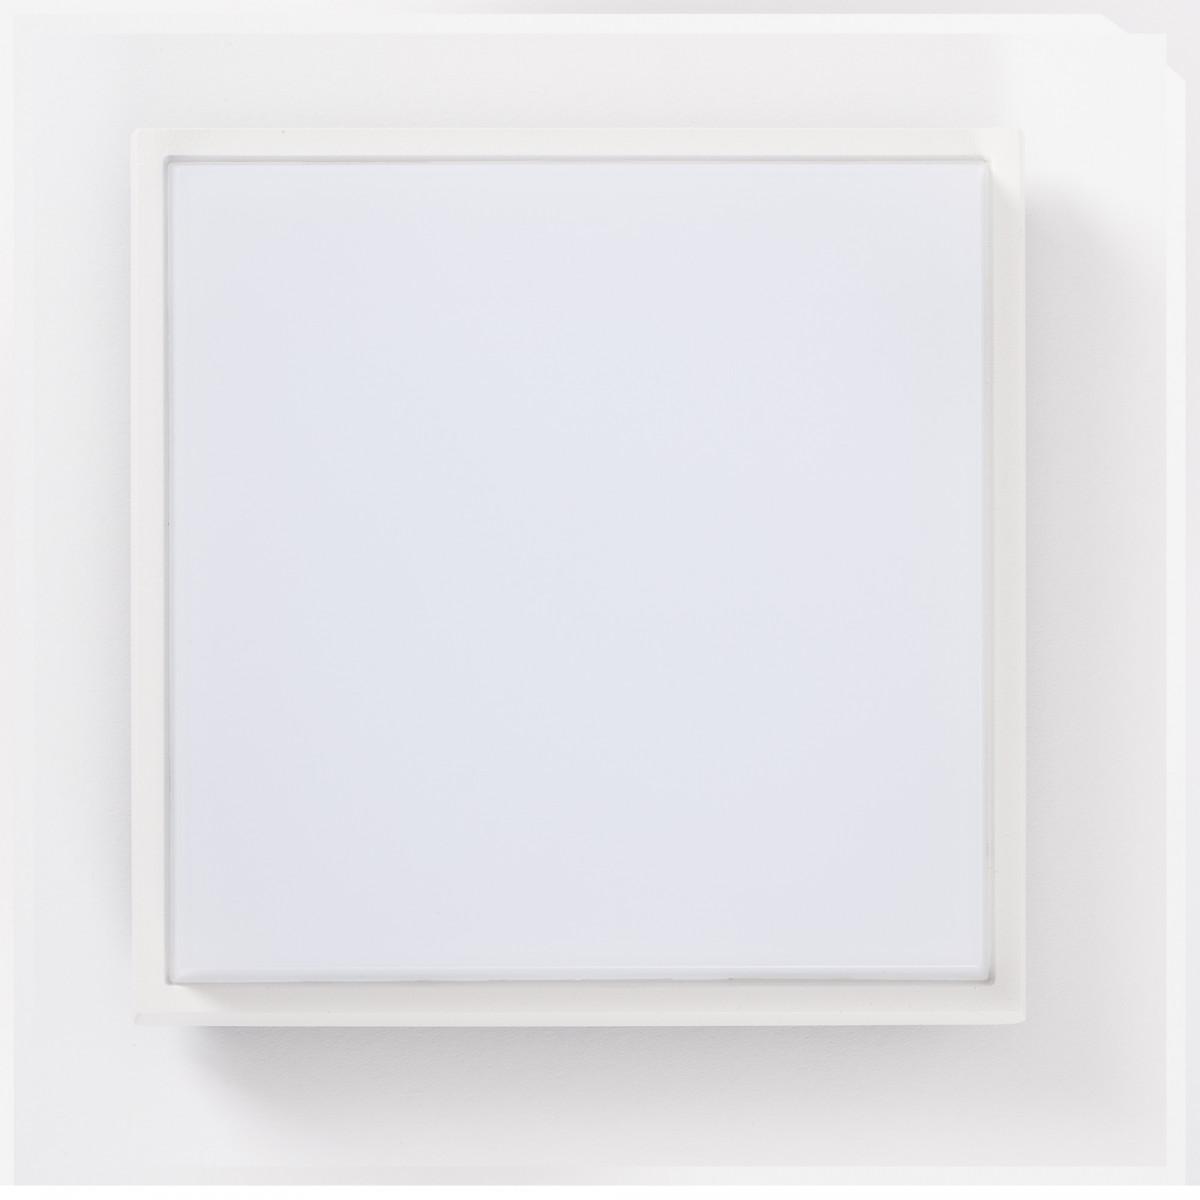 Buitenlamp Buitenlamp Stealth square